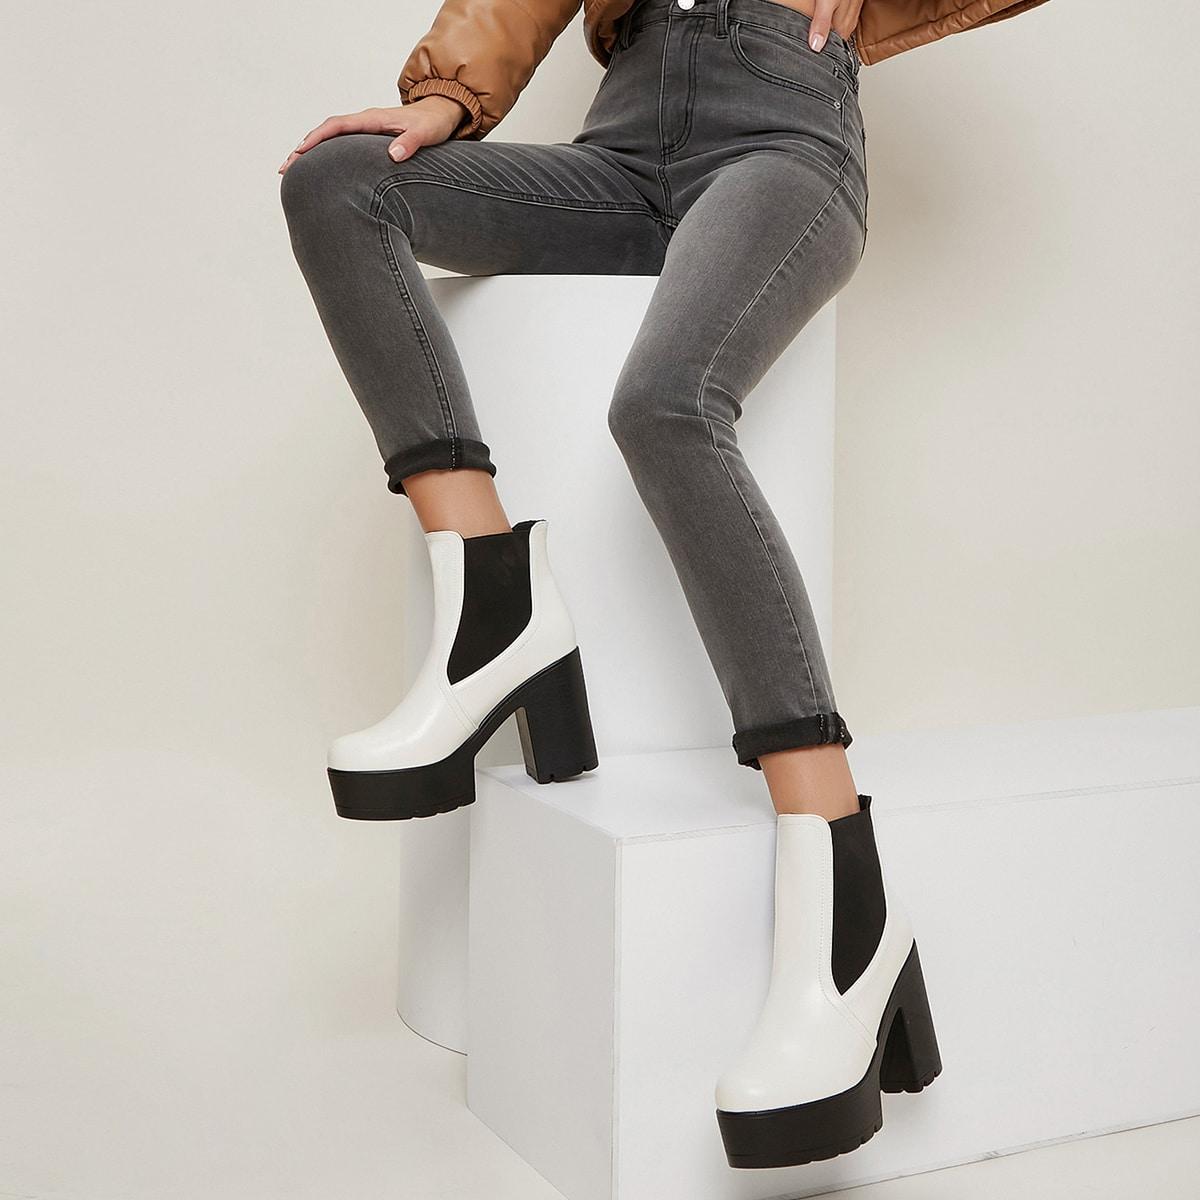 Сапоги челси на высоким каблуке